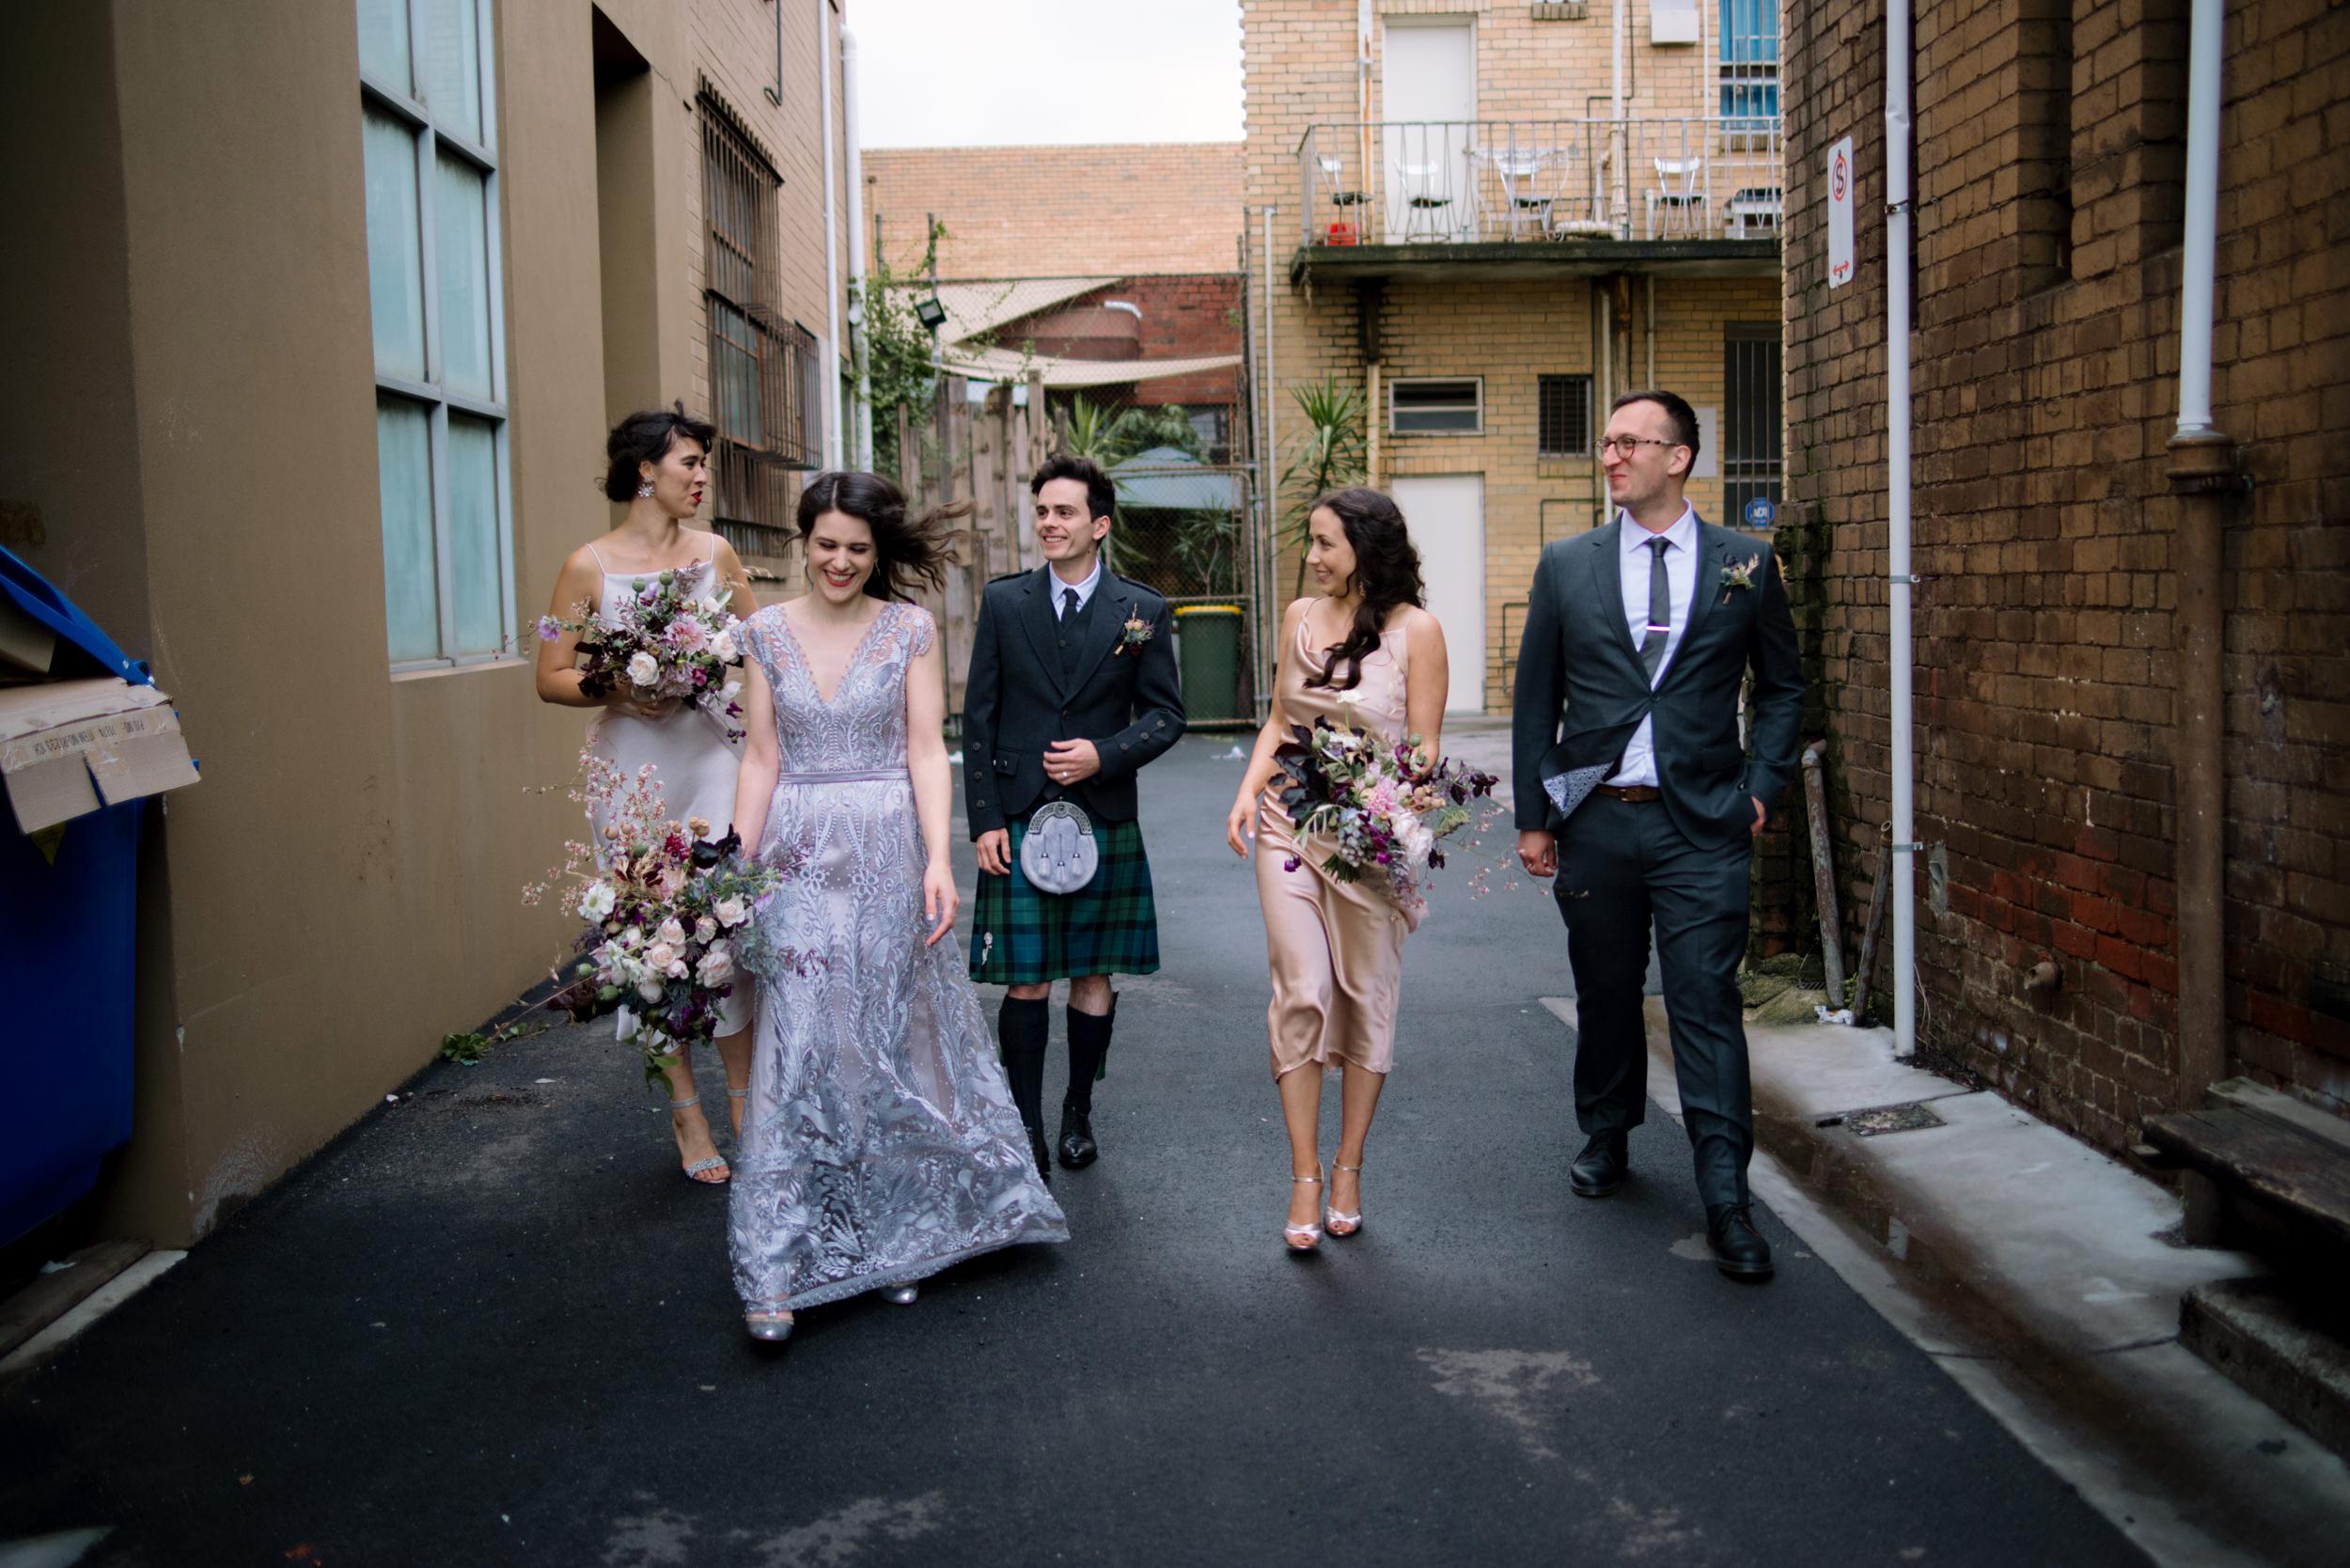 I-Got-You-Babe-&.Co.-Glasshaus-Wedding-Charlotte-Cameron0096.JPG